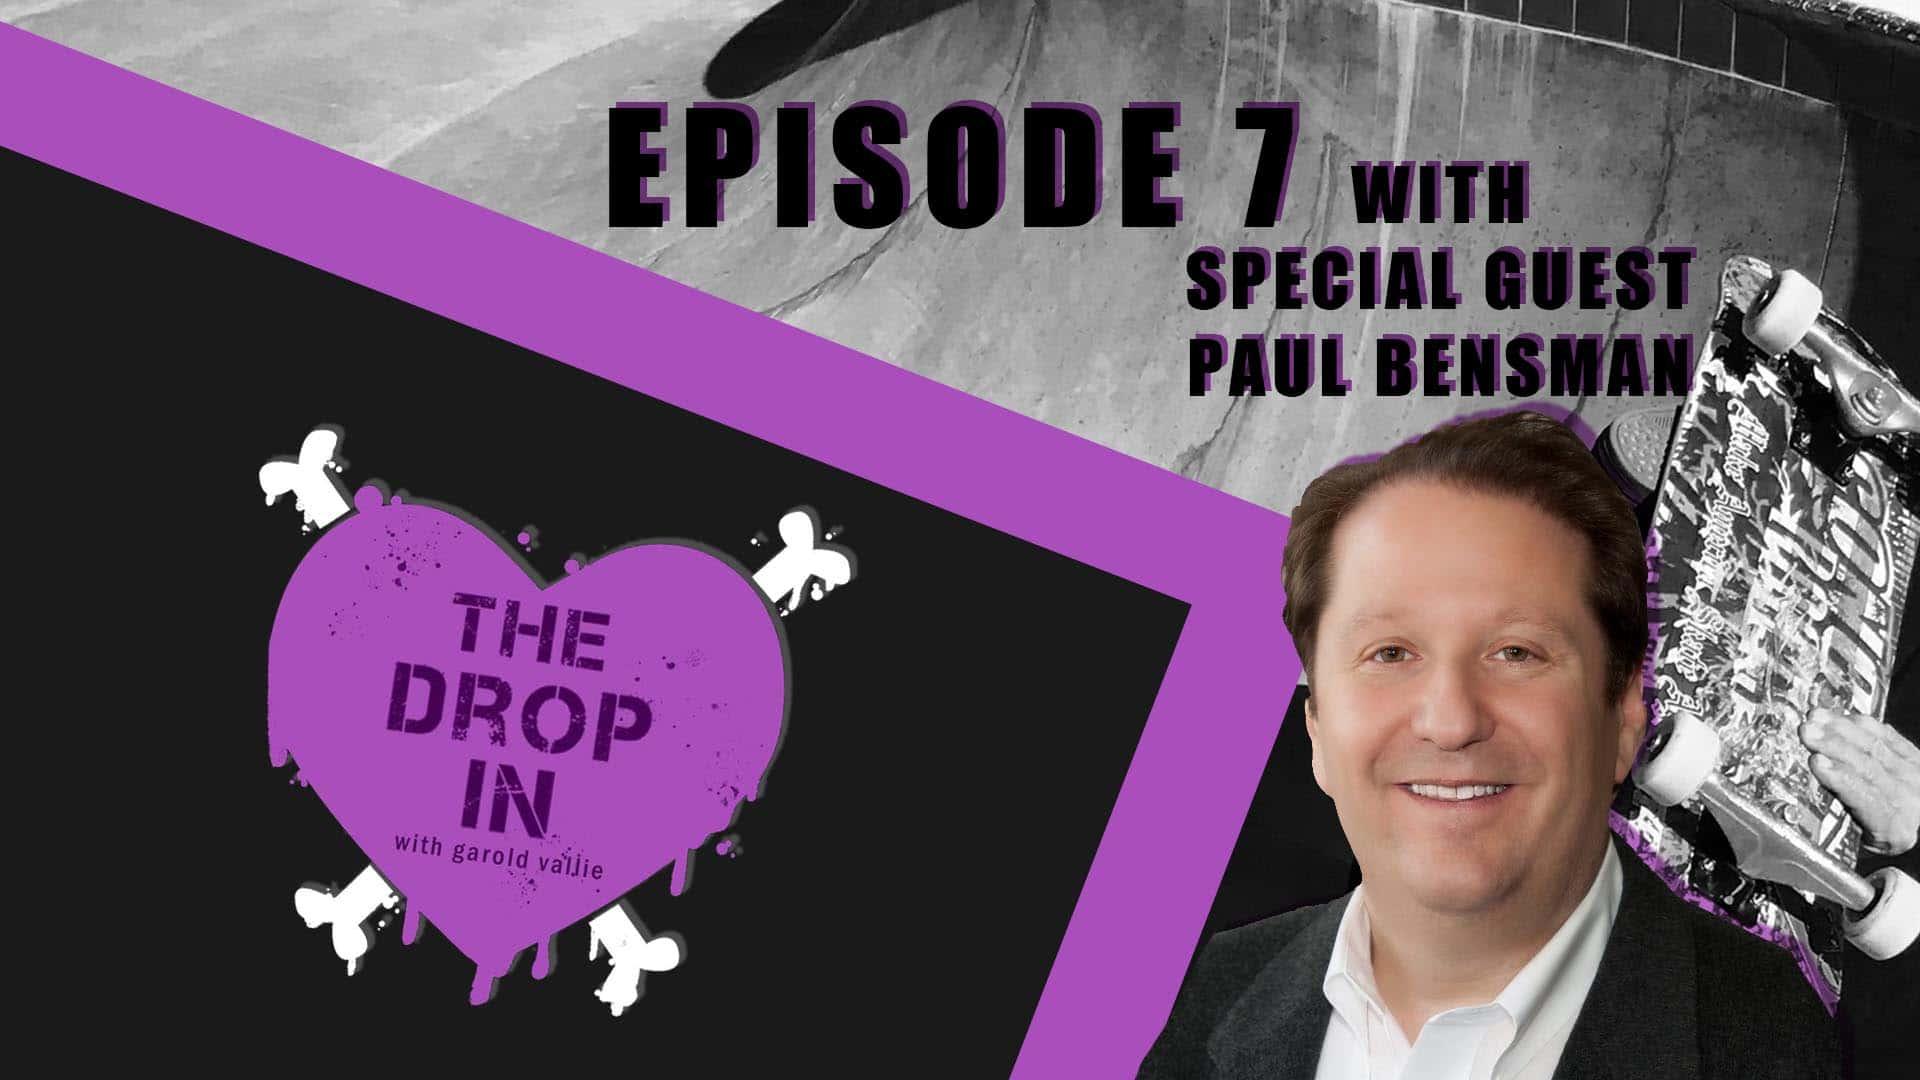 The Drop In with Garold Vallie - Episode 7